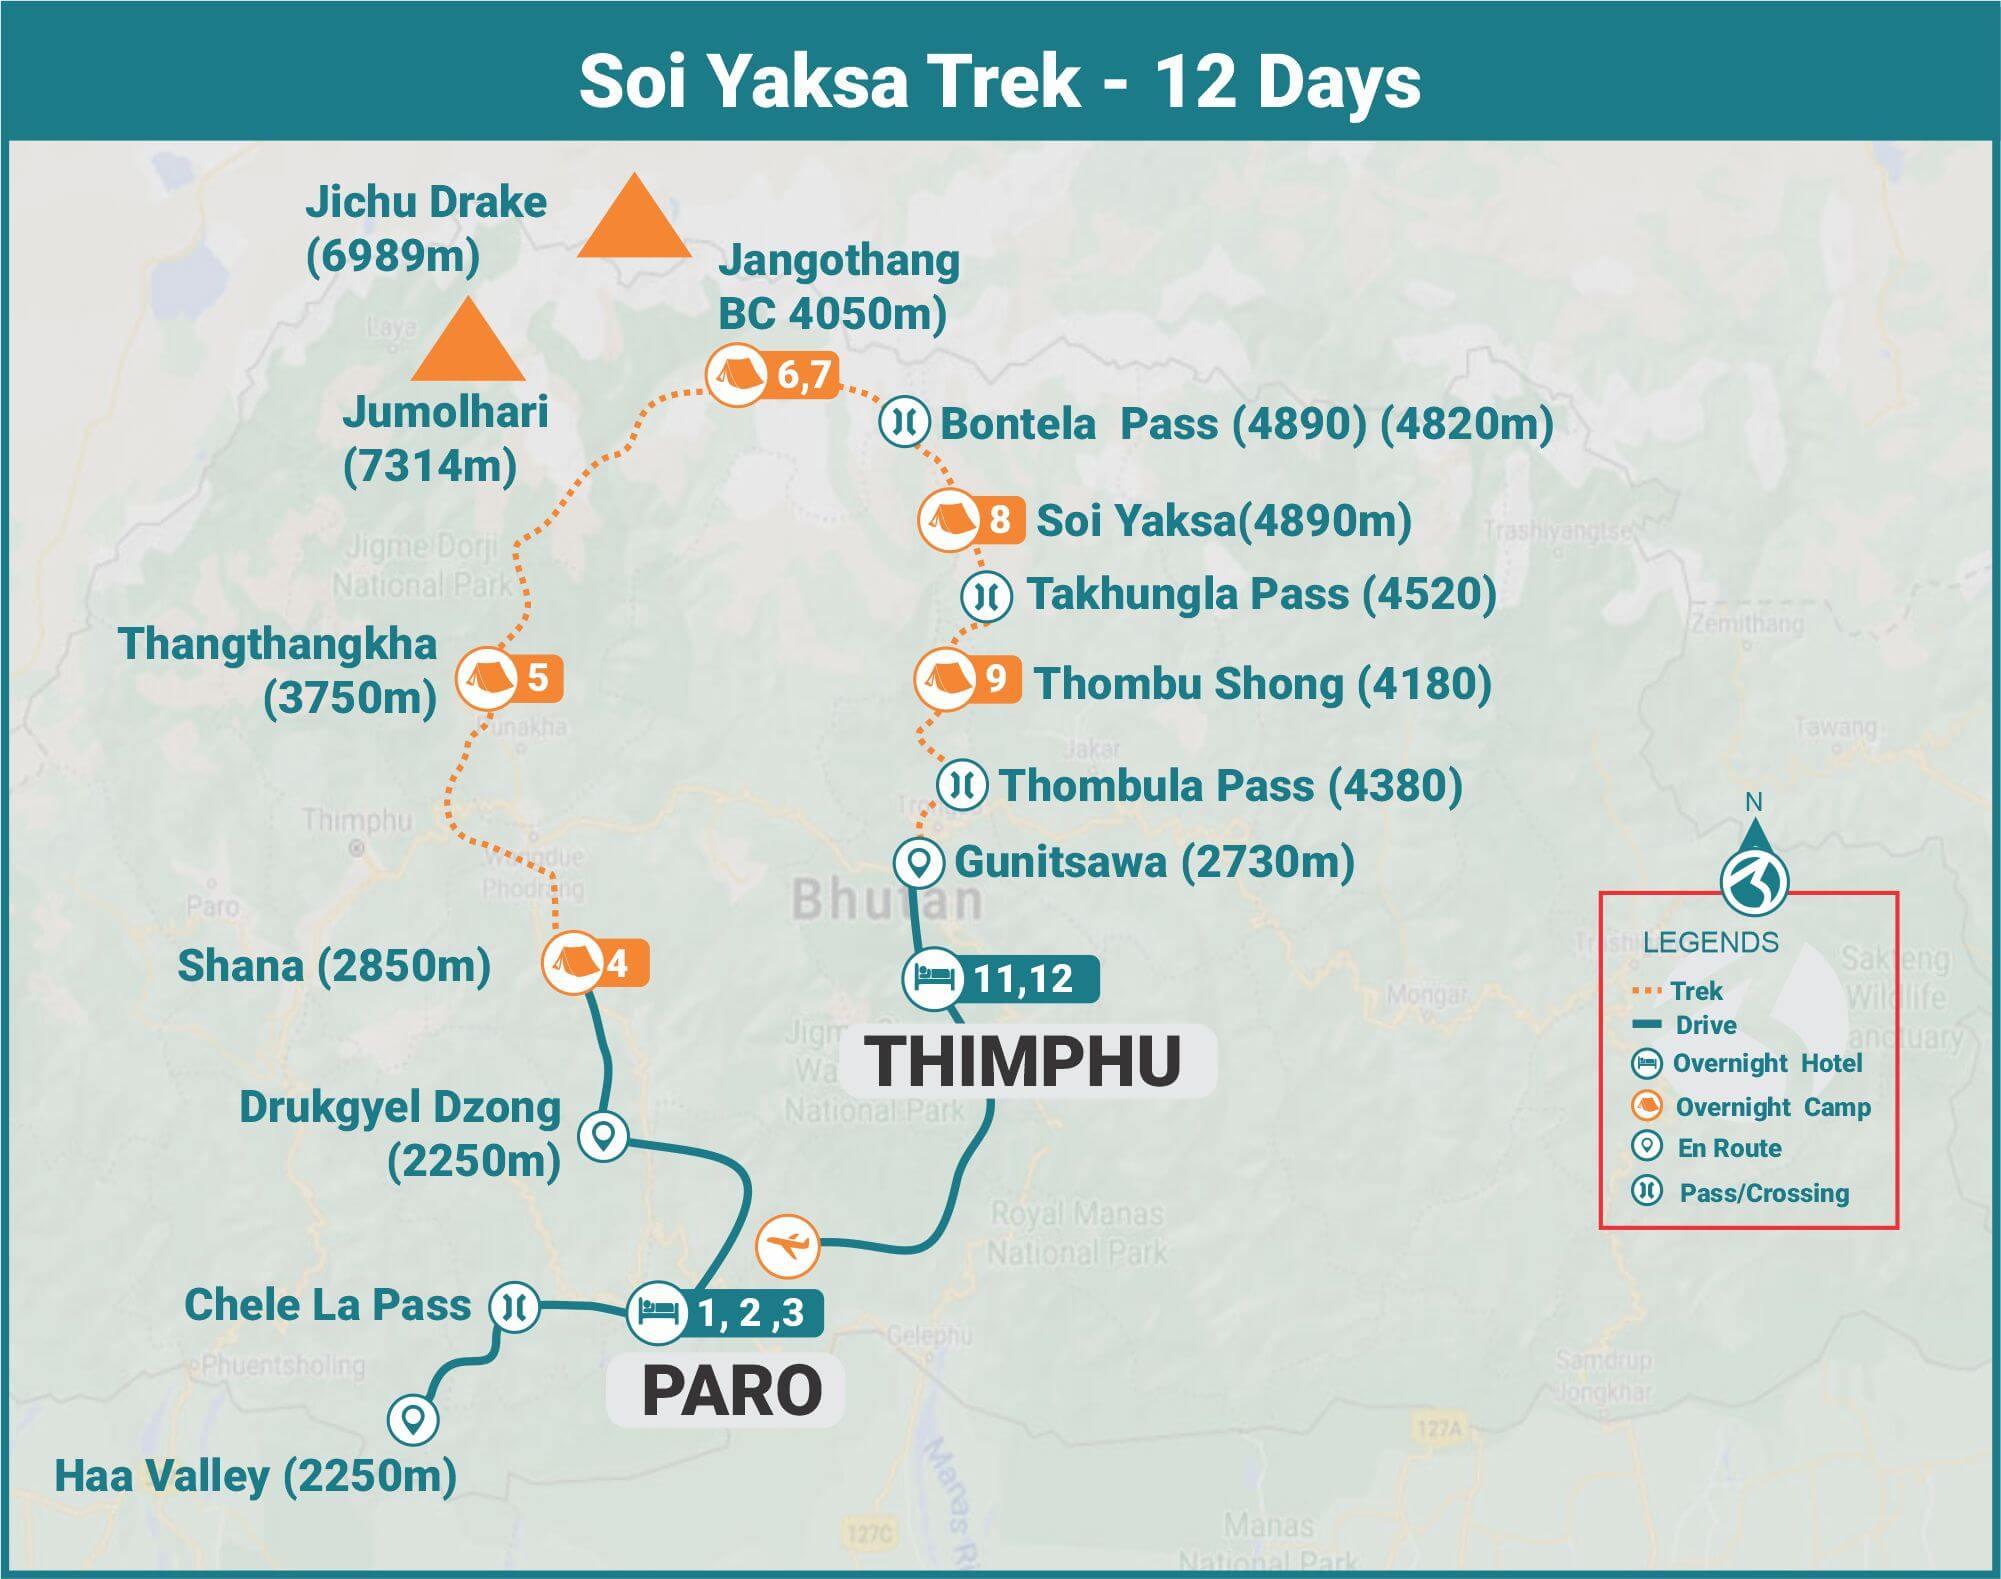 Soi Yaksa Trek 12 days Route Map